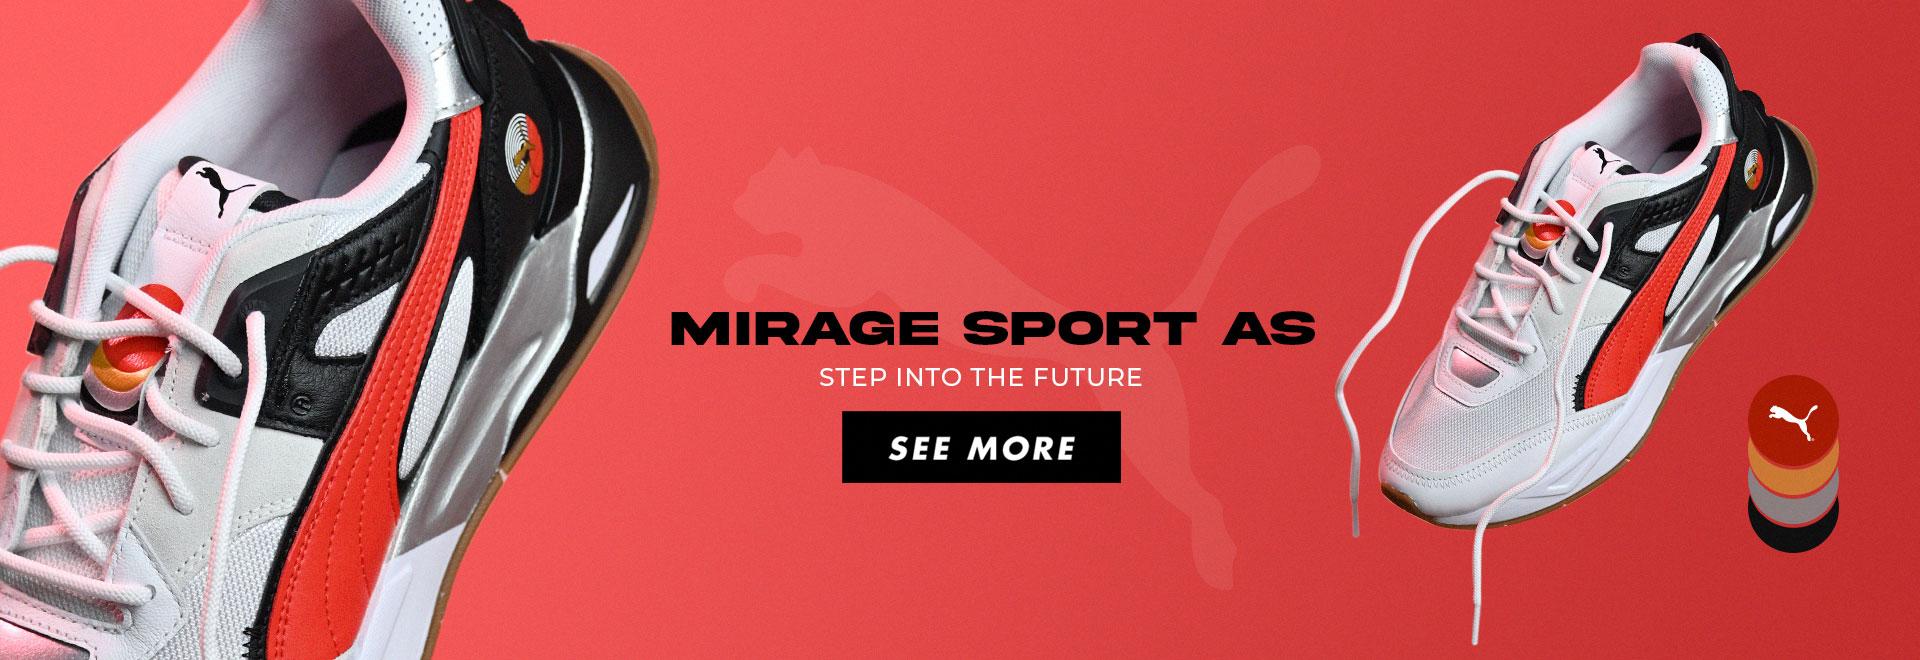 Puma Mirage